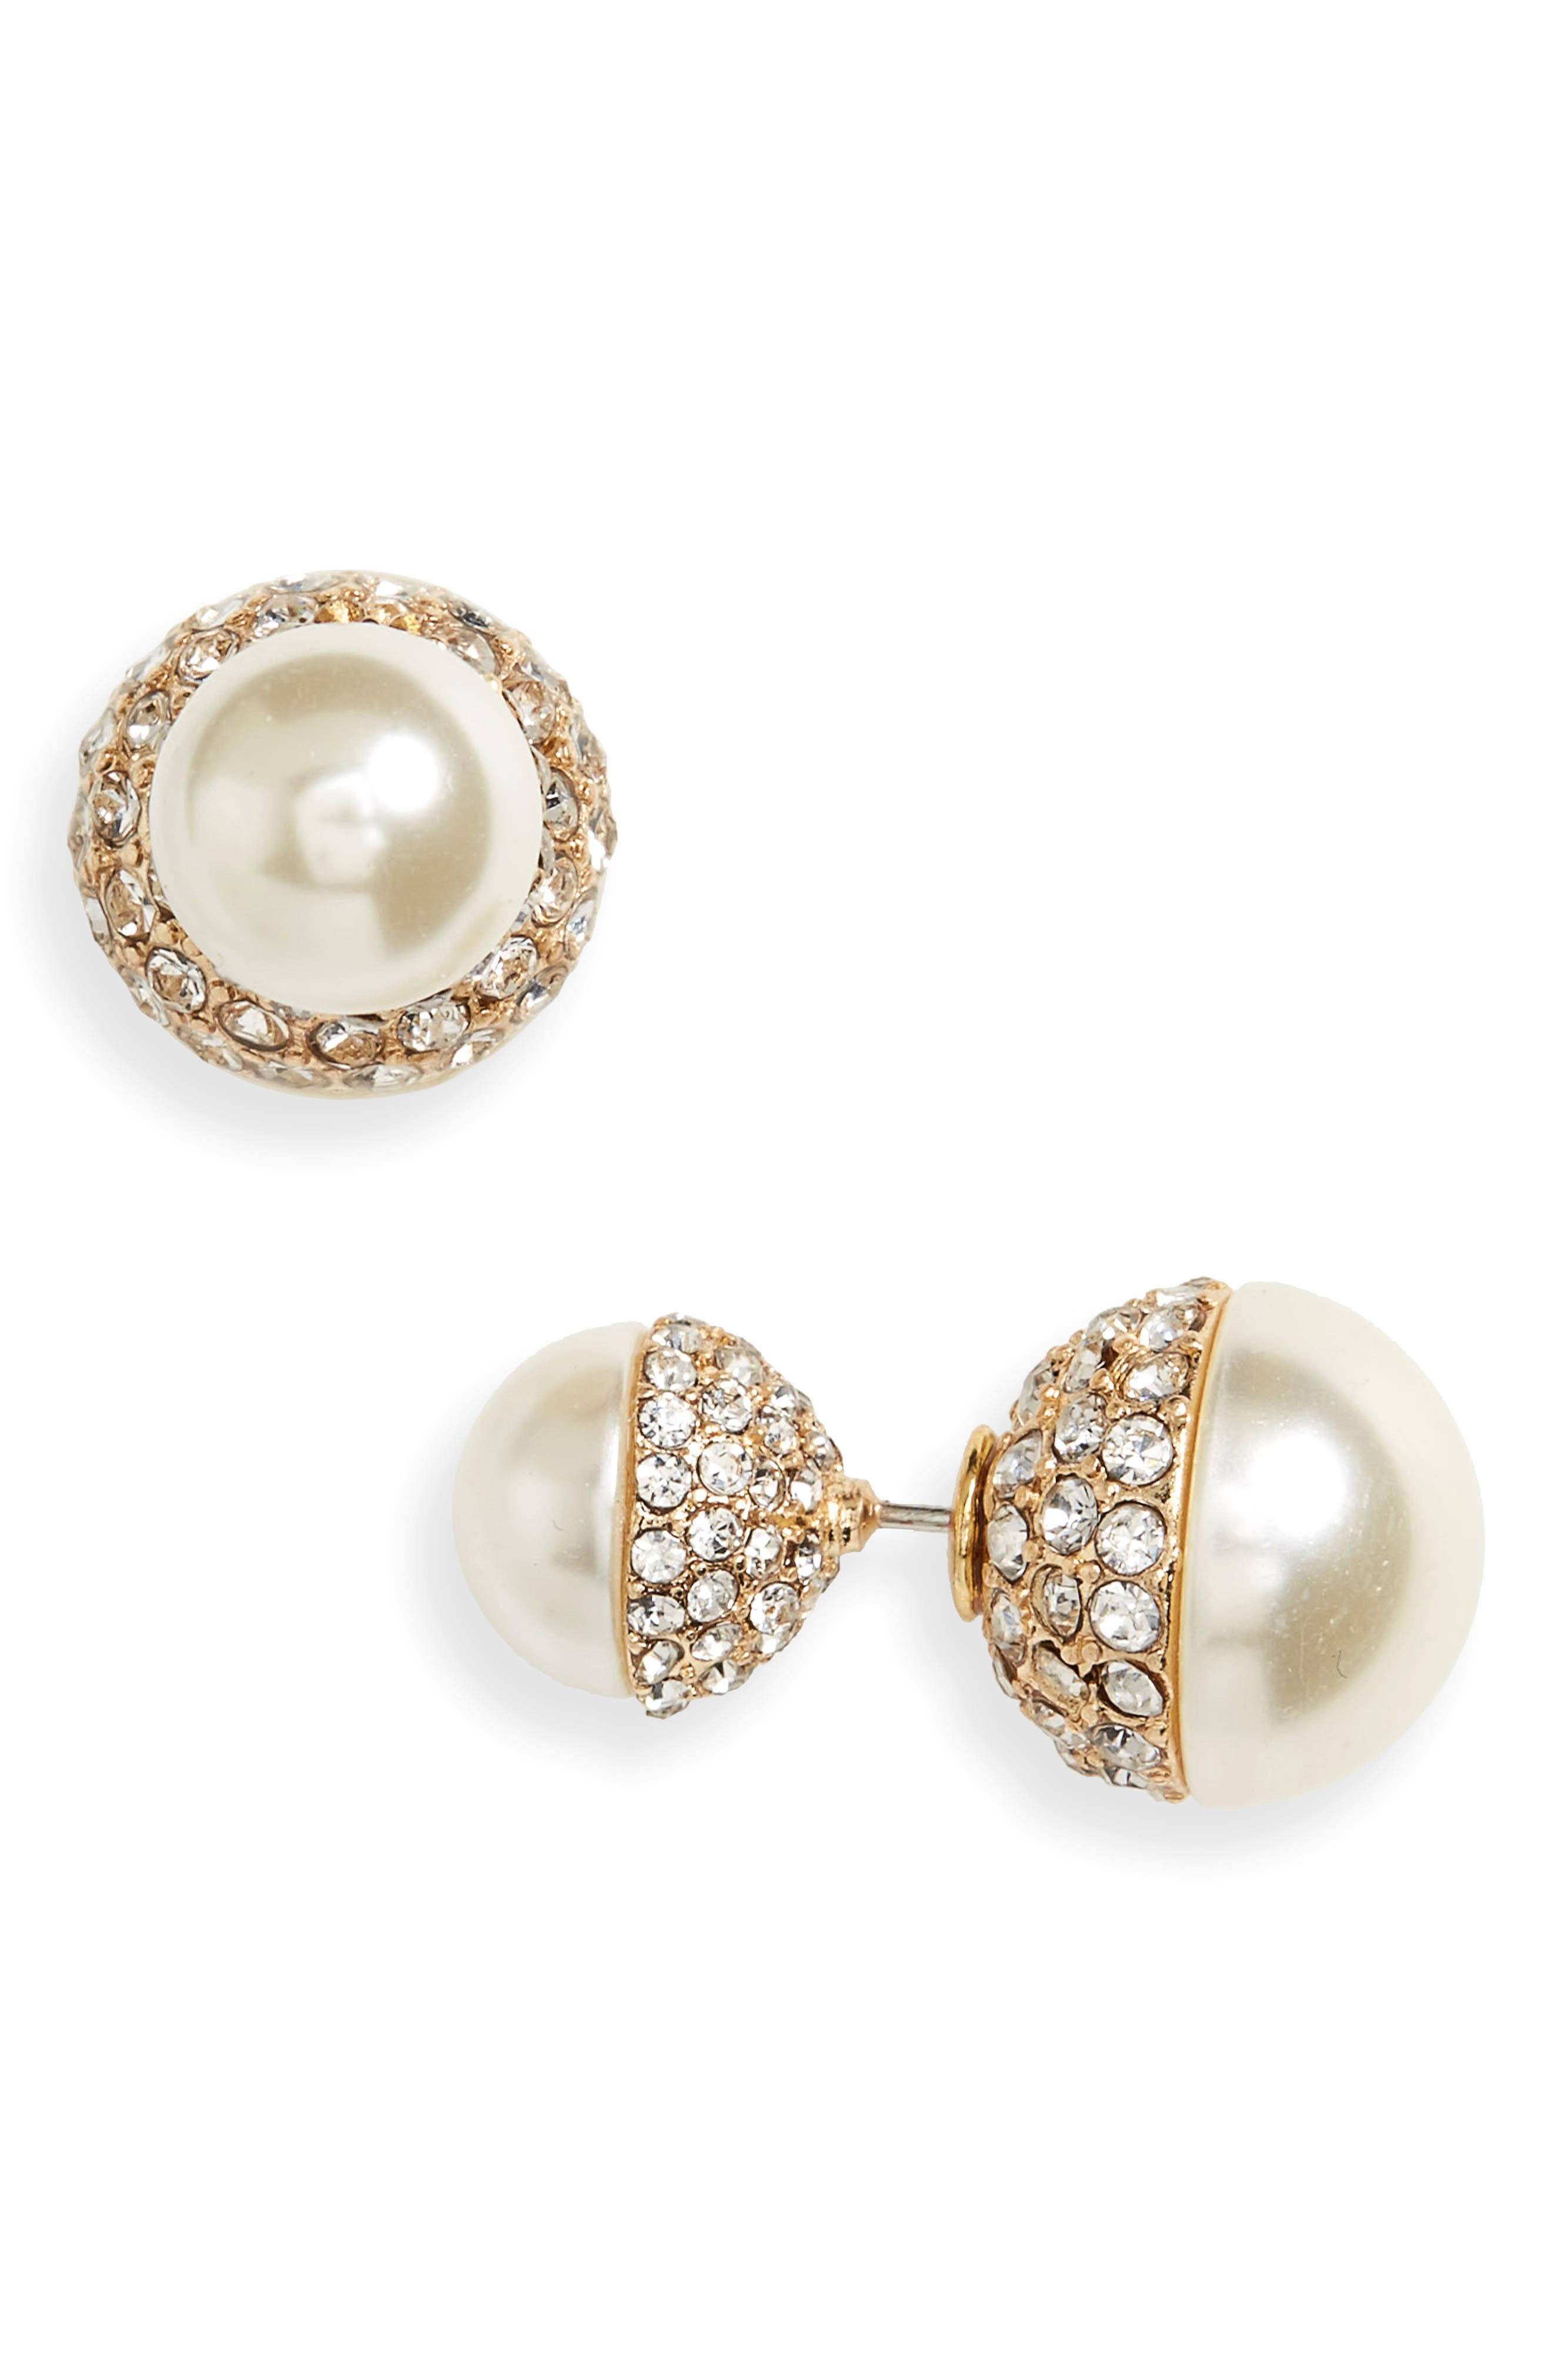 Imitation Pearl & Crystal Front/Back Earrings,                             Main thumbnail 1, color,                             710